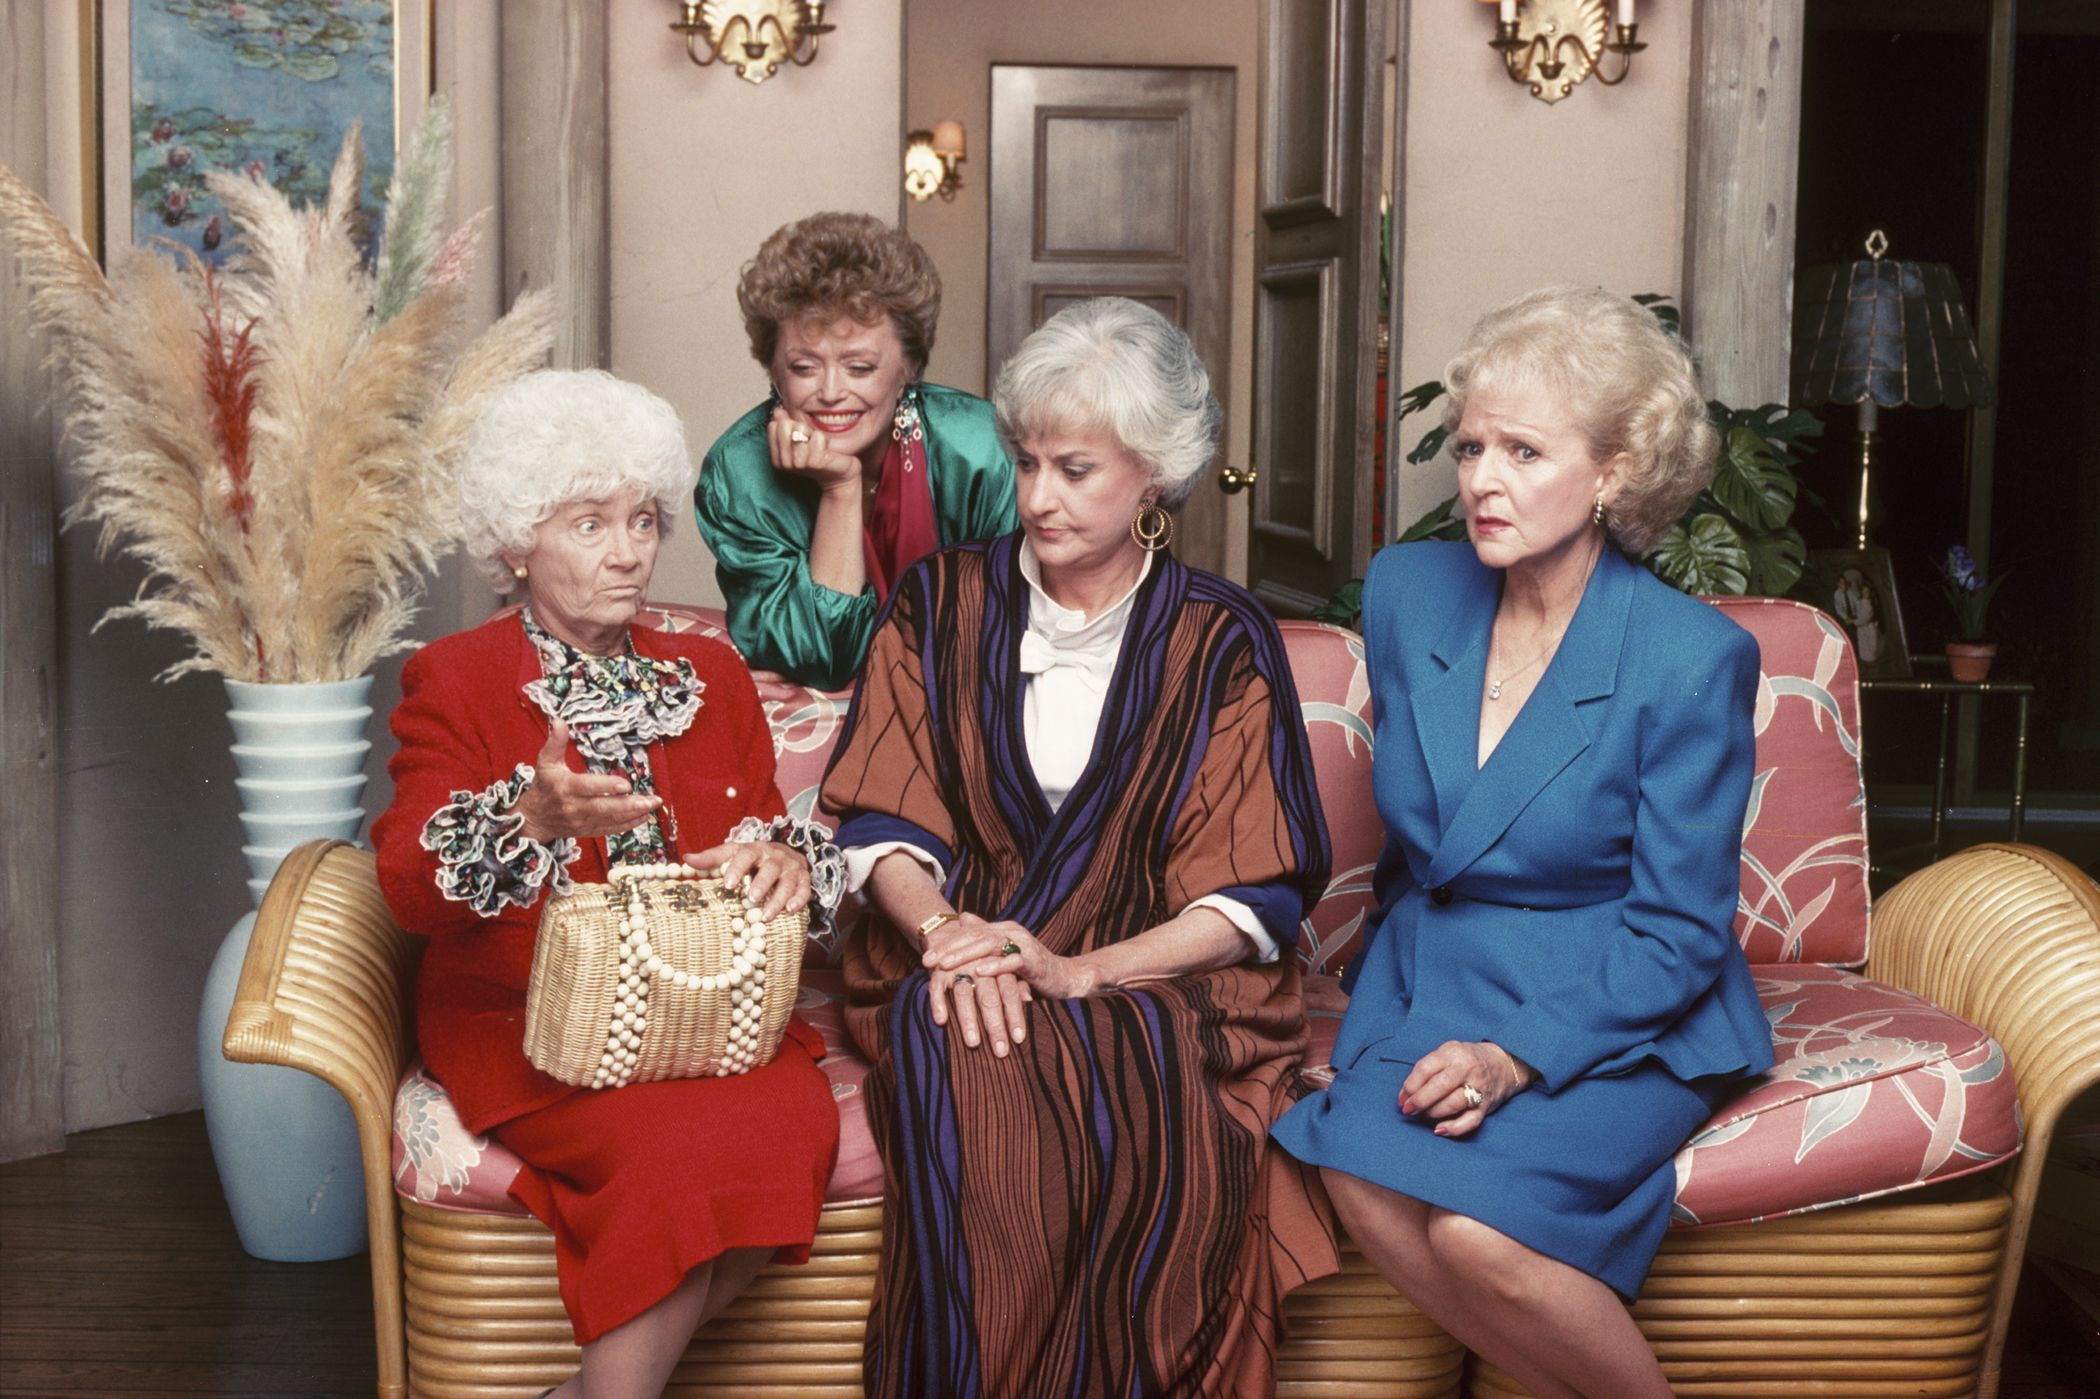 The Golden Girls, Estelle Getty, Rue McClanahan, Bea Arthur, Betty White